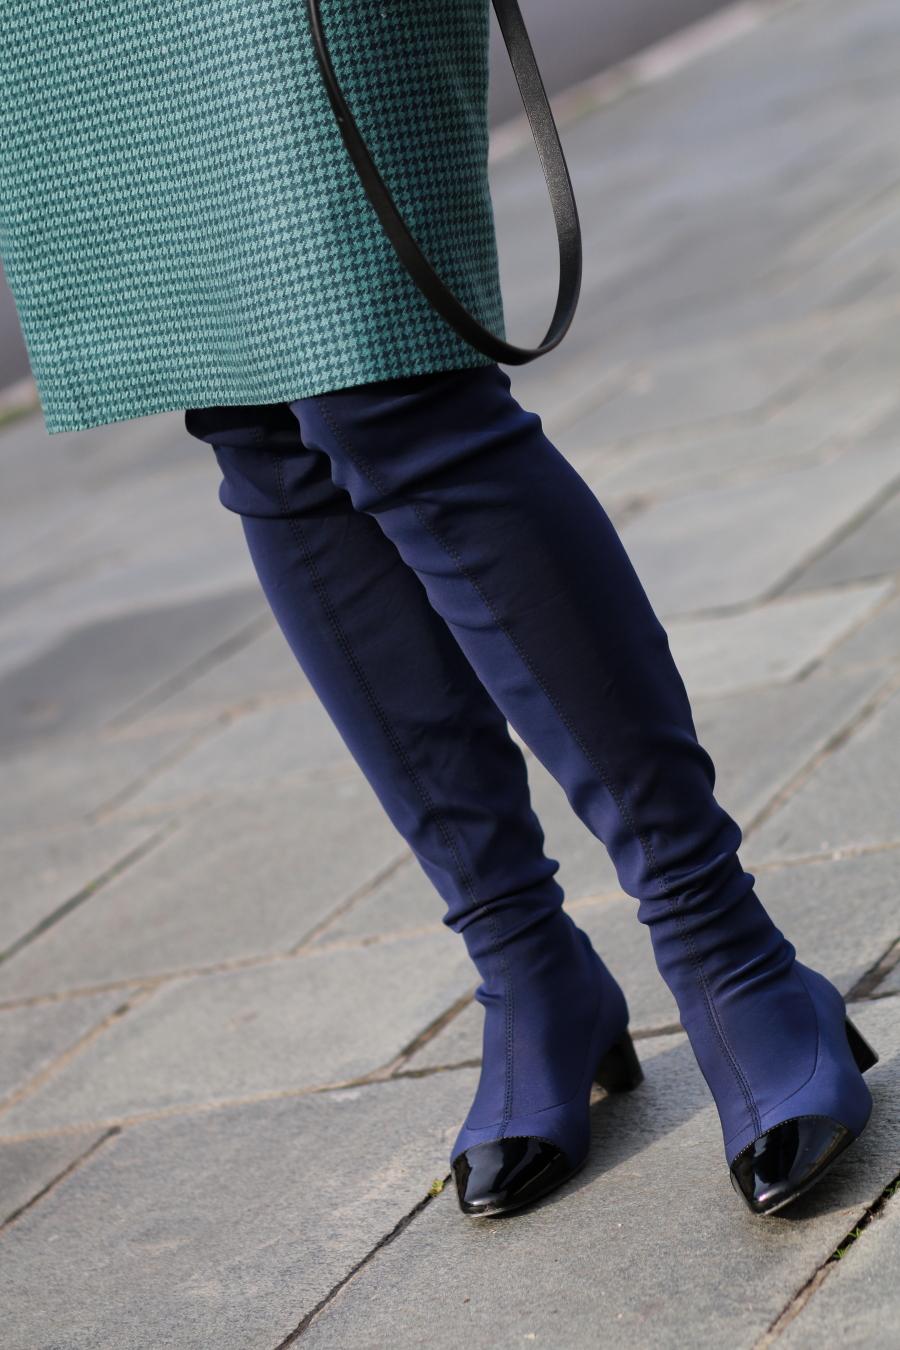 cuissardes storie moda stellina stivali zara